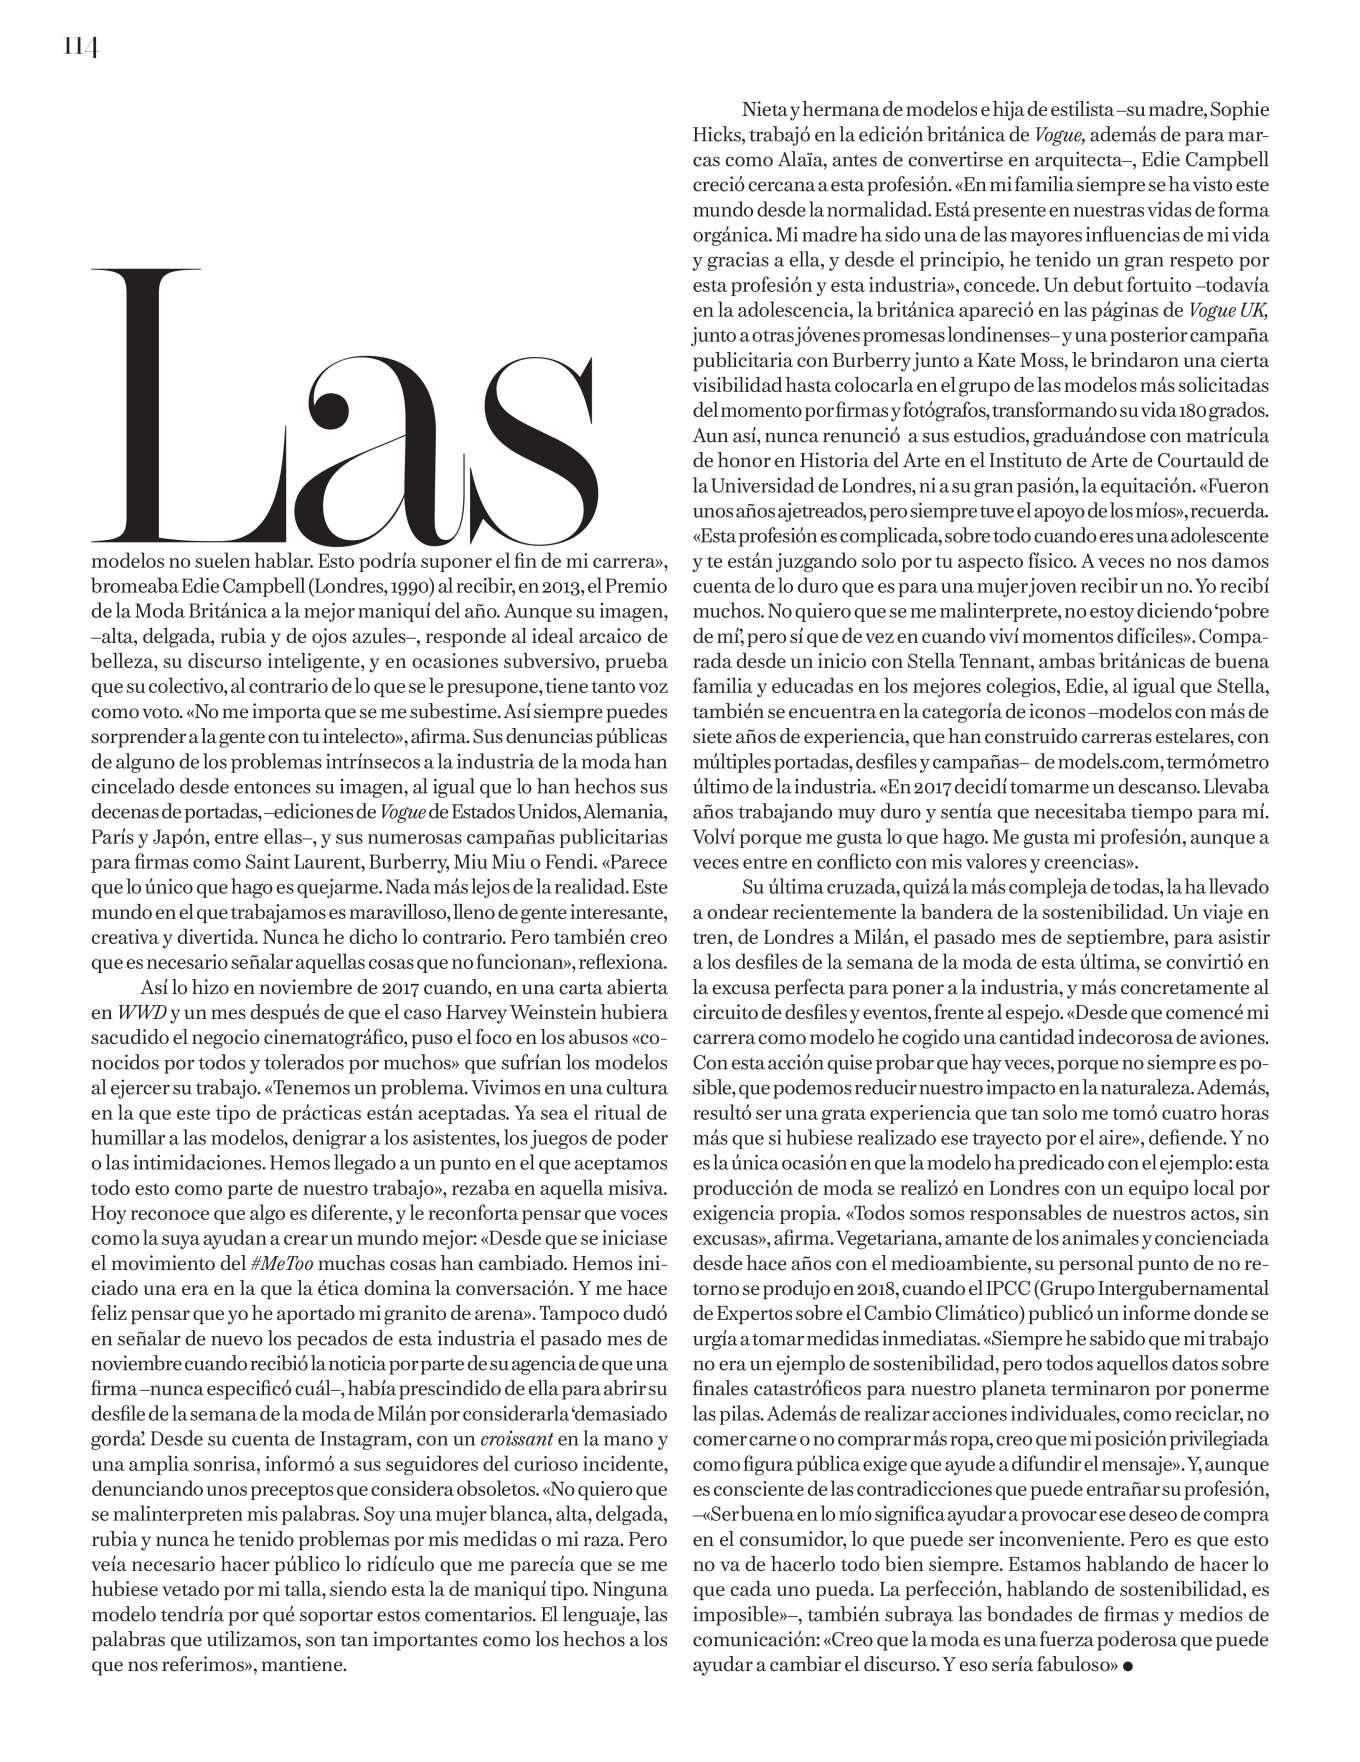 Edie Campbell 2019 : Edie Campbell – Vogue Espana 2020-05